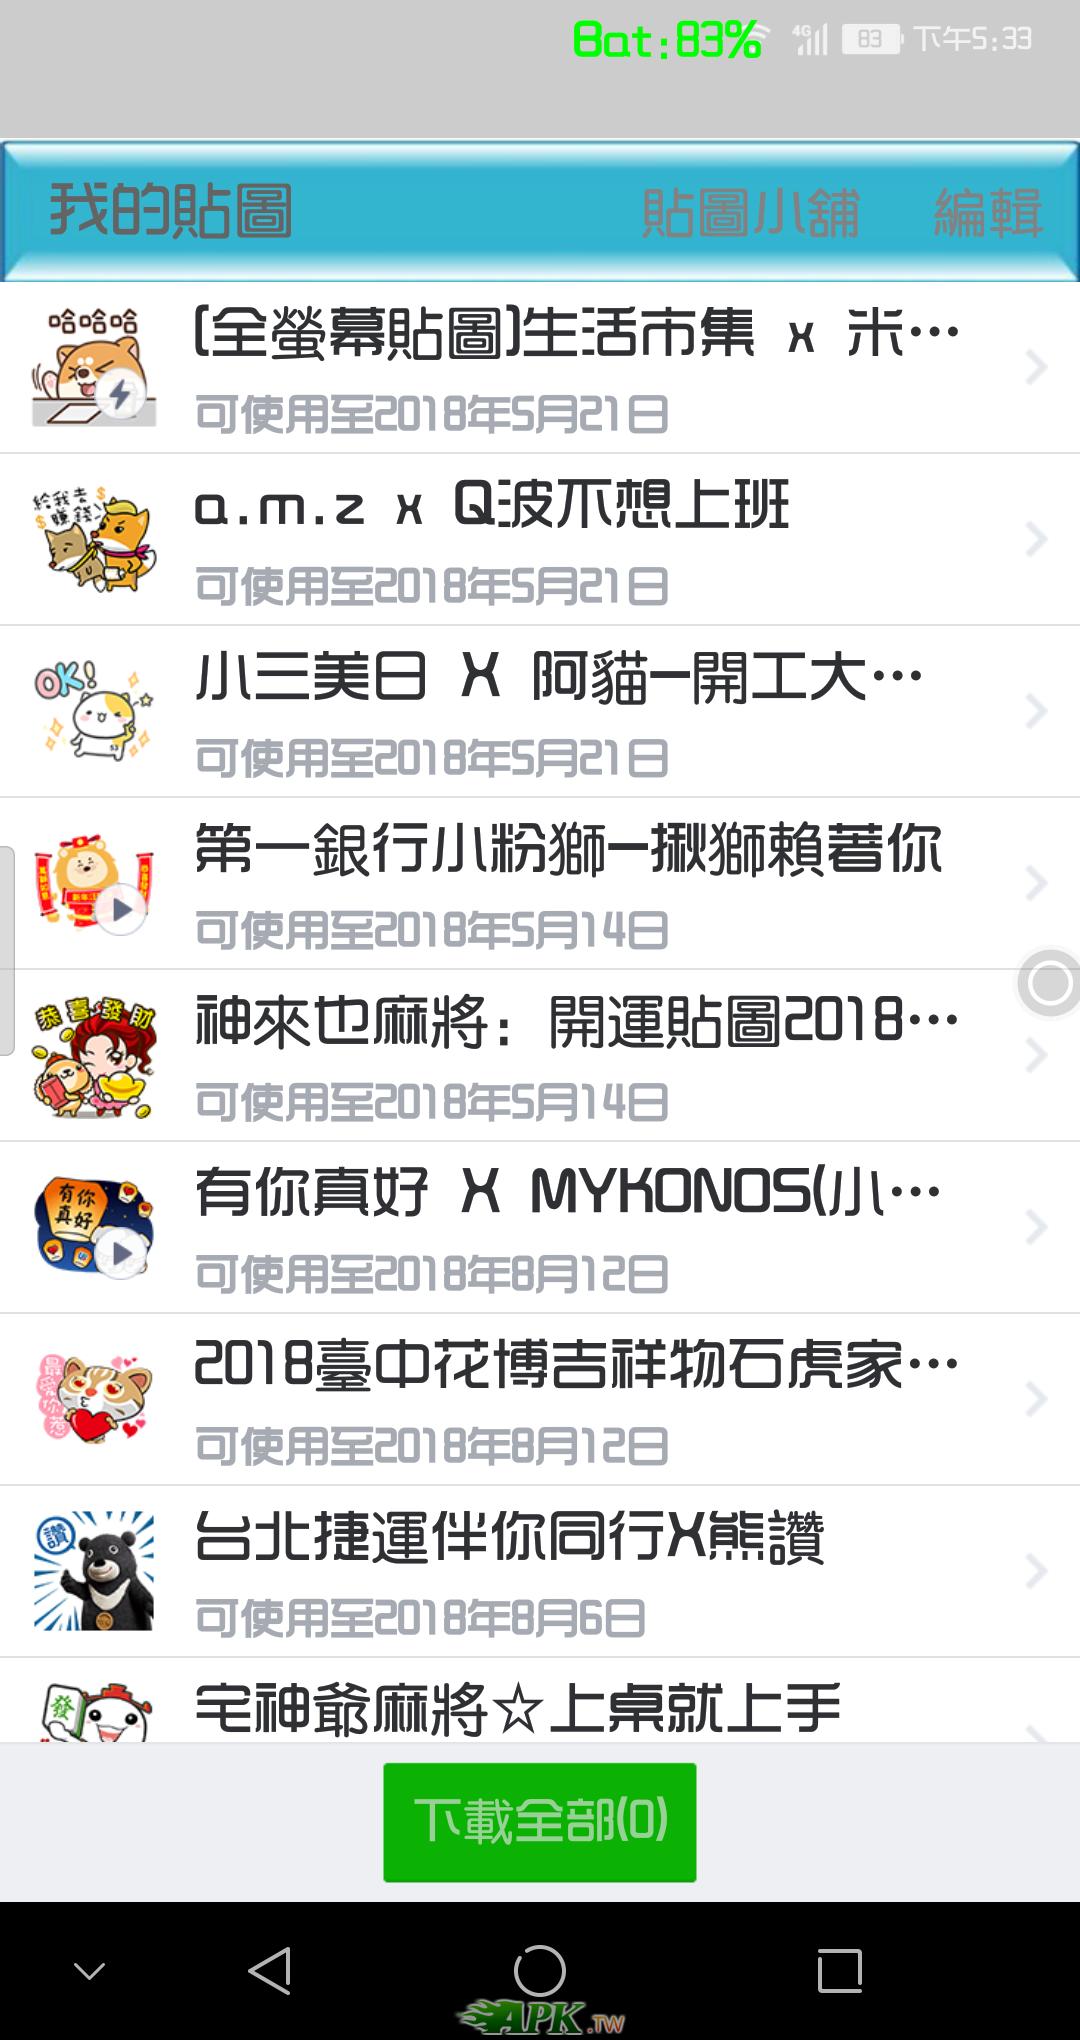 Screenshot_2018-02-20-17-33-59.png